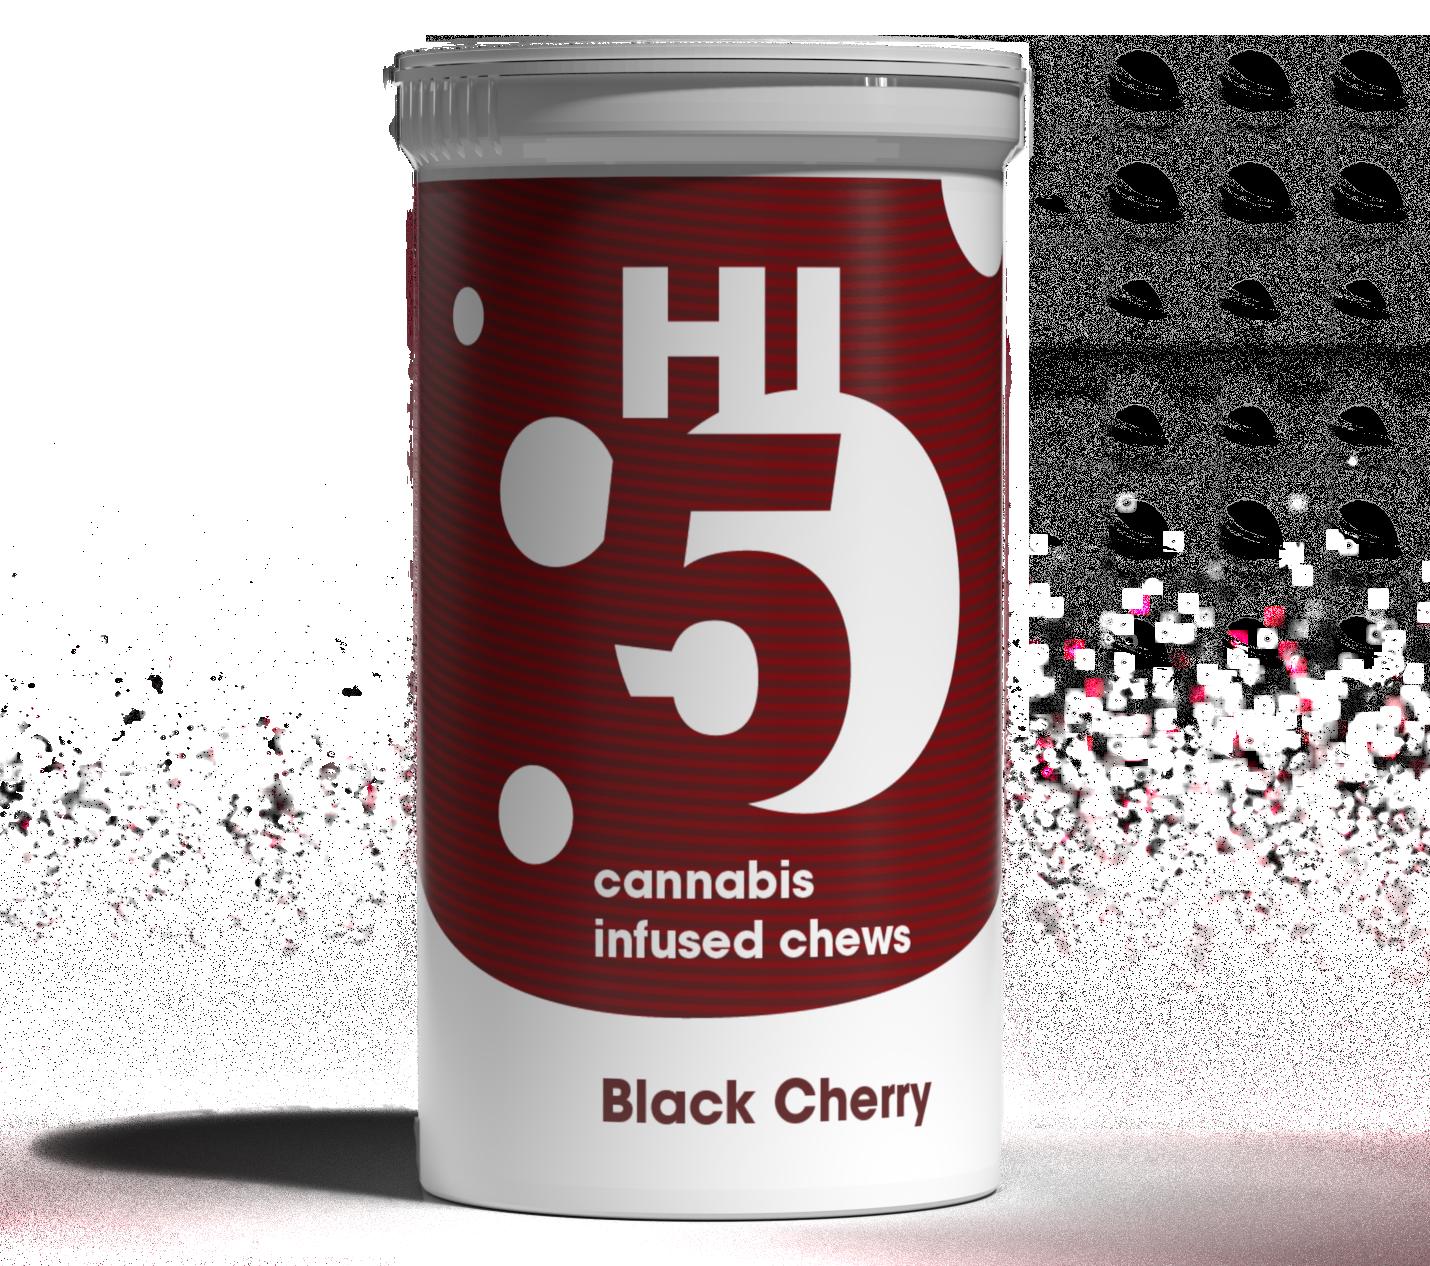 Black Cherry Chew